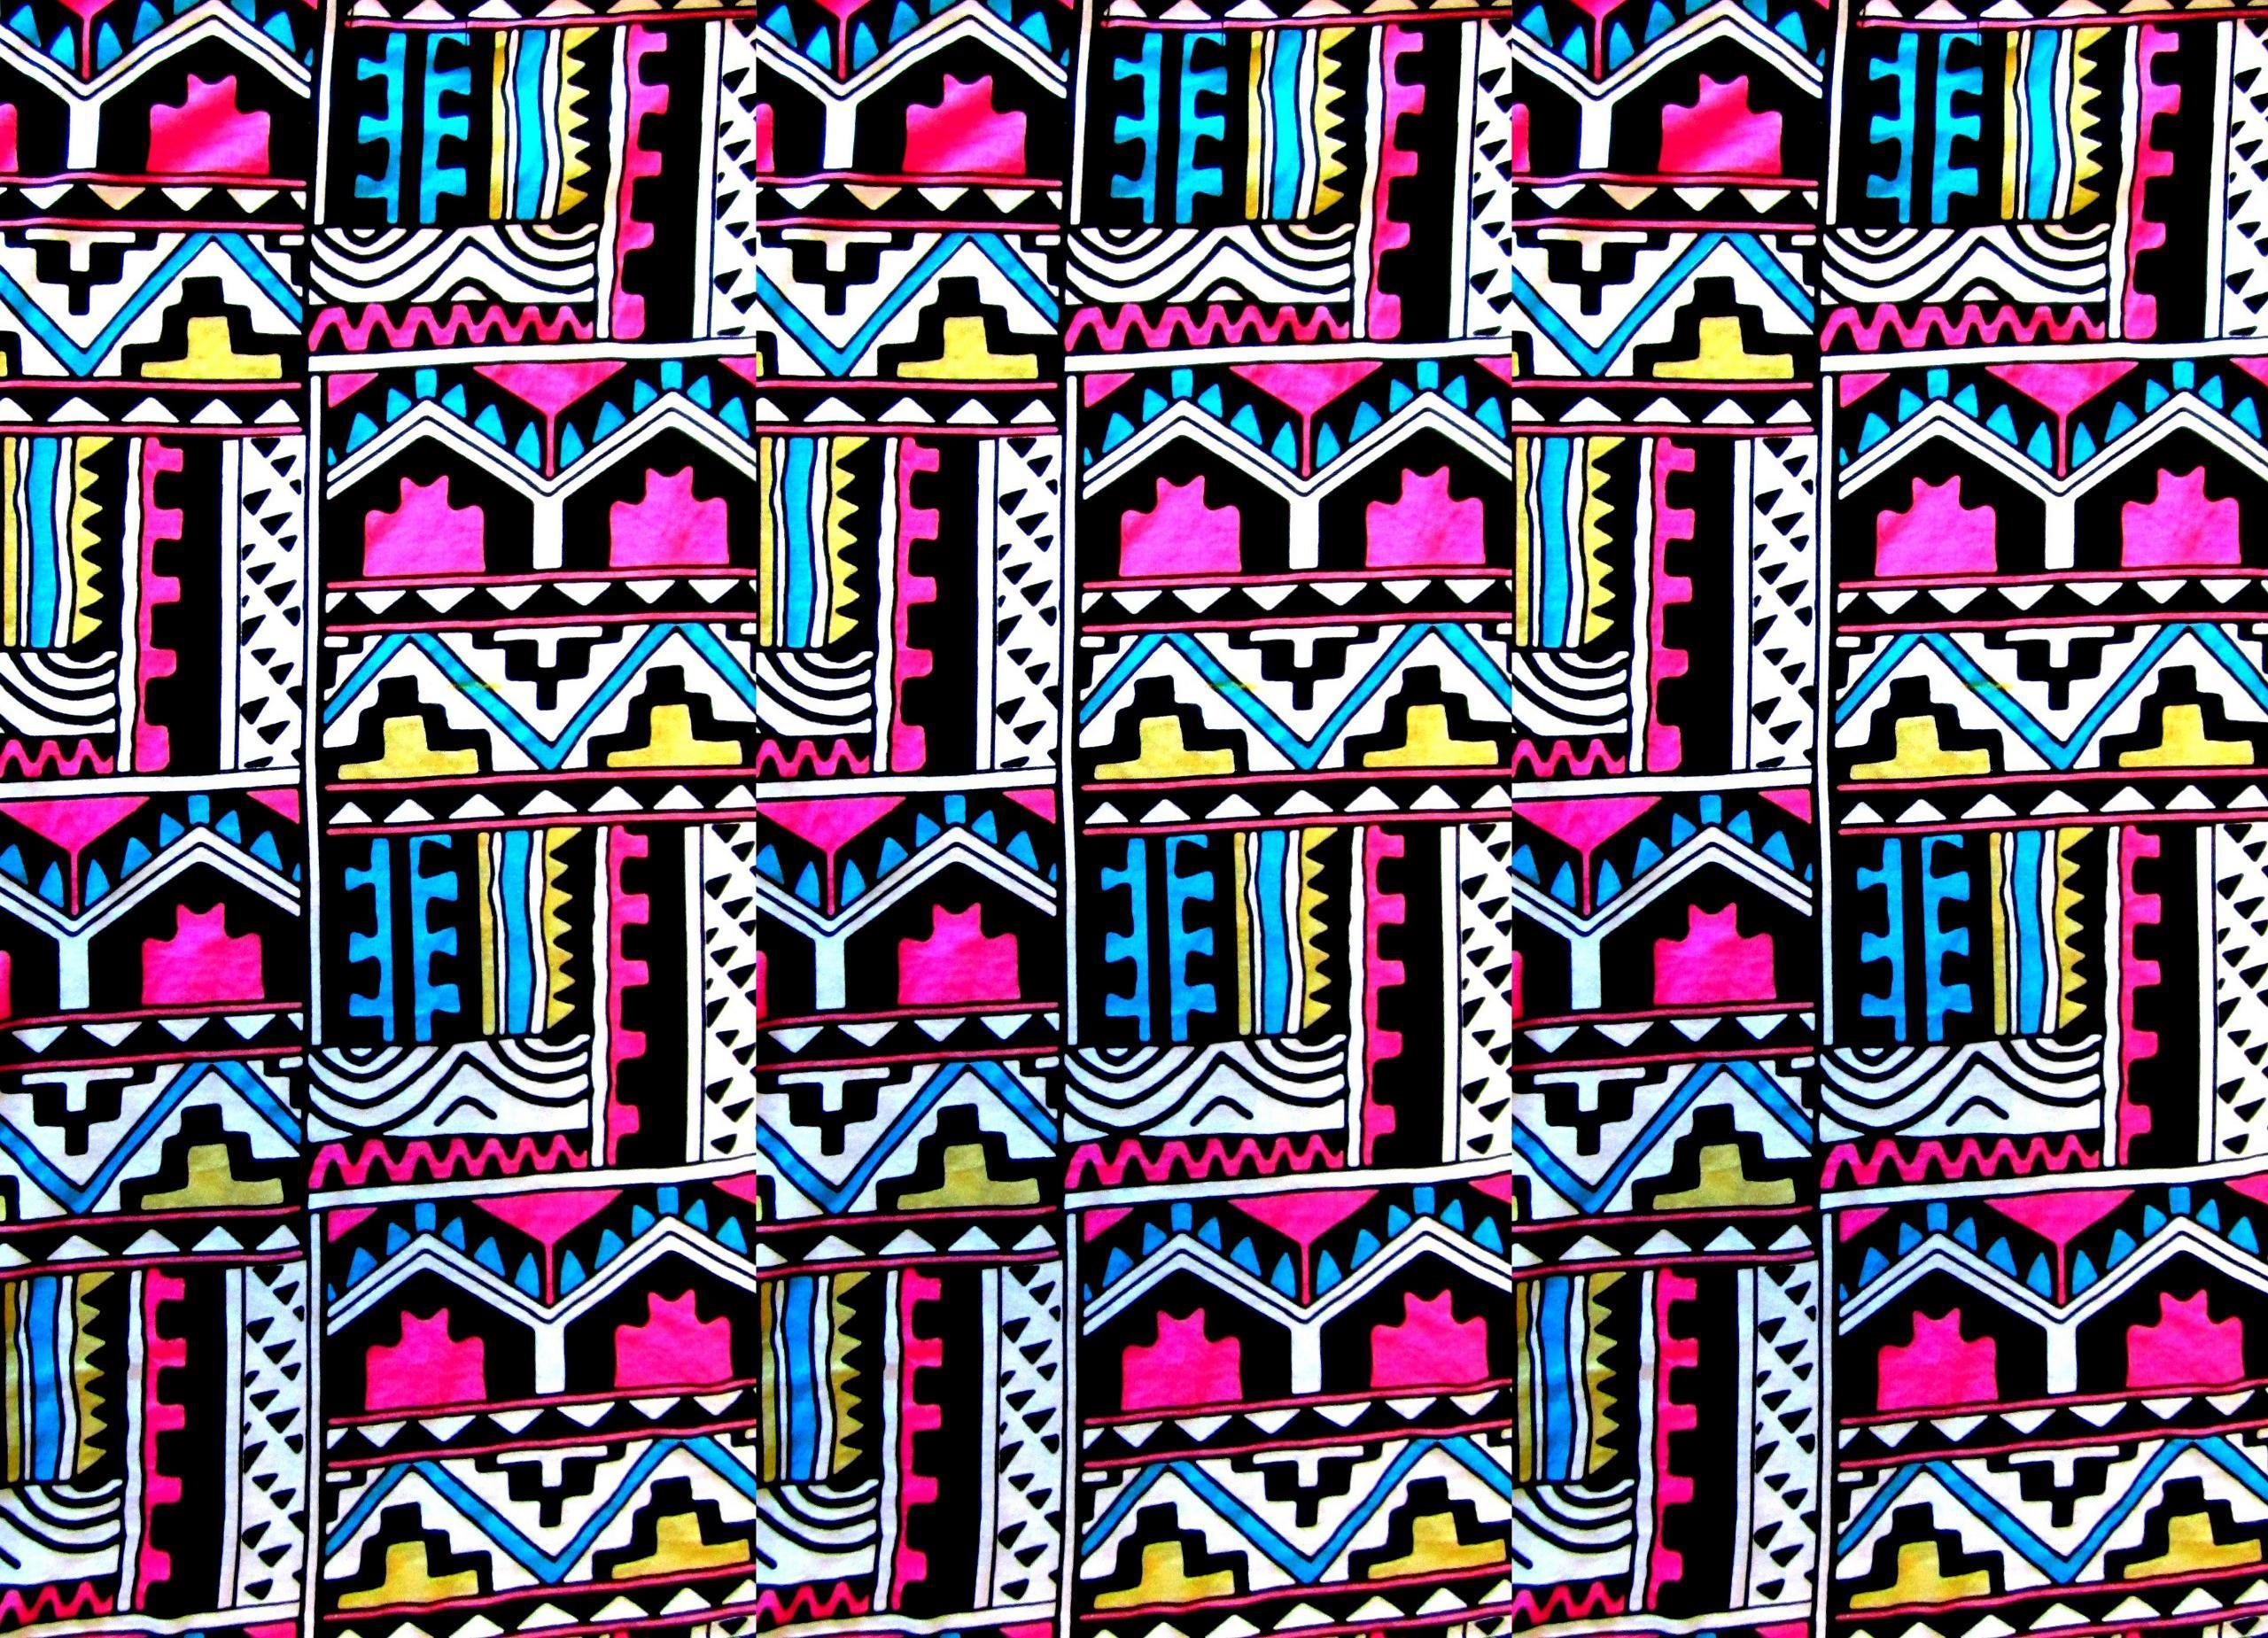 Backgrounds Tumblr Aztec - Wallpaper Cave